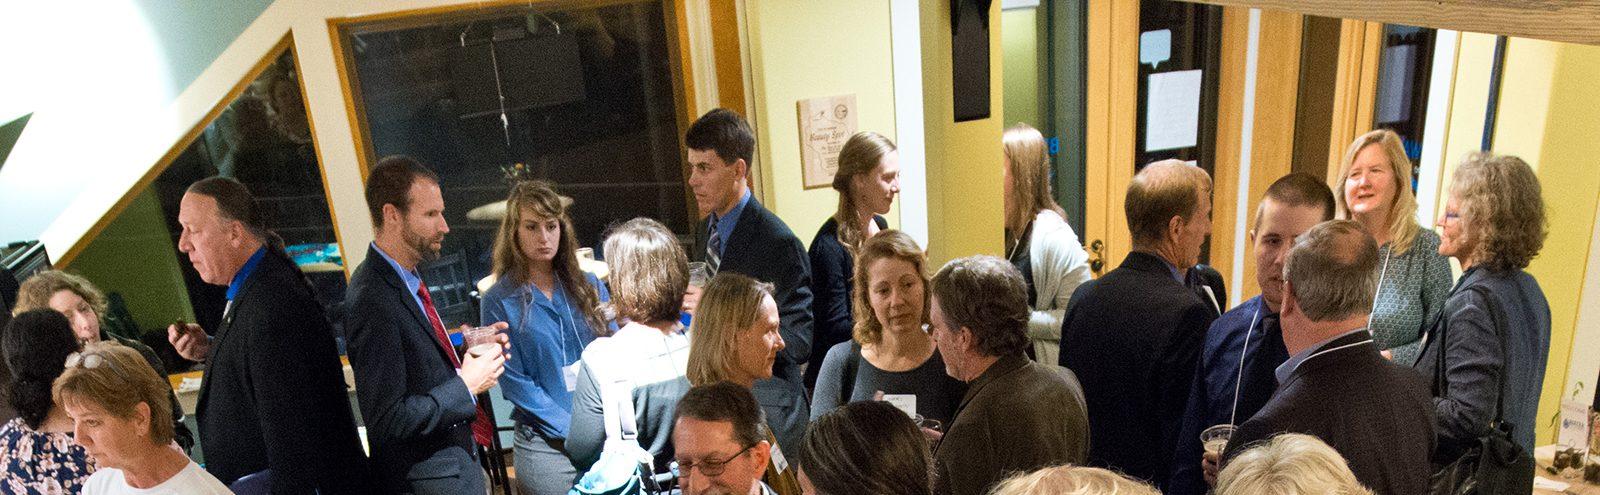 Alumni gathering at Northland College Water Summit